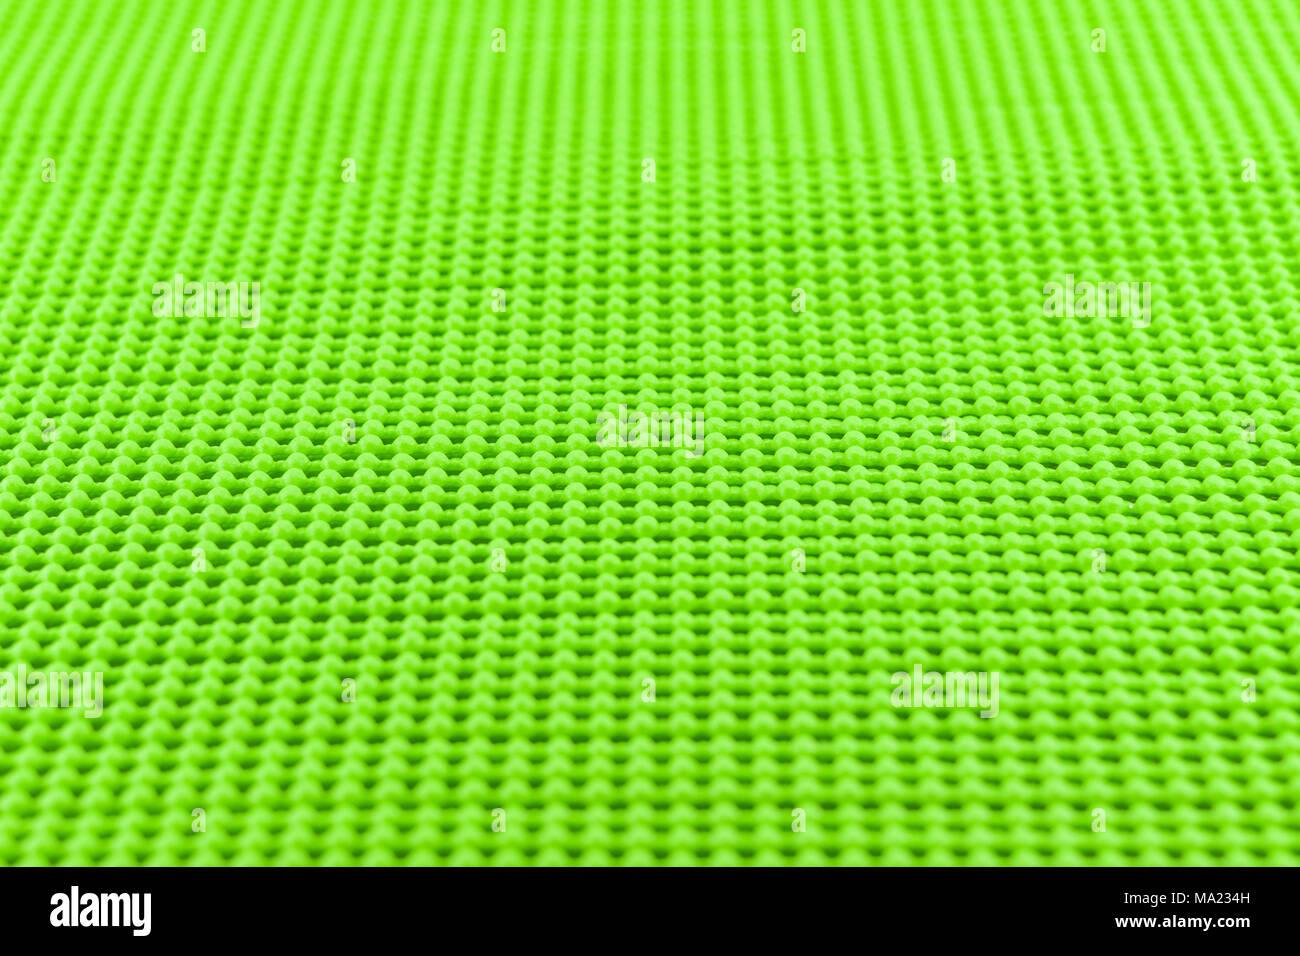 Detail grün Strukturierte rutschfeste Matte Stockbild